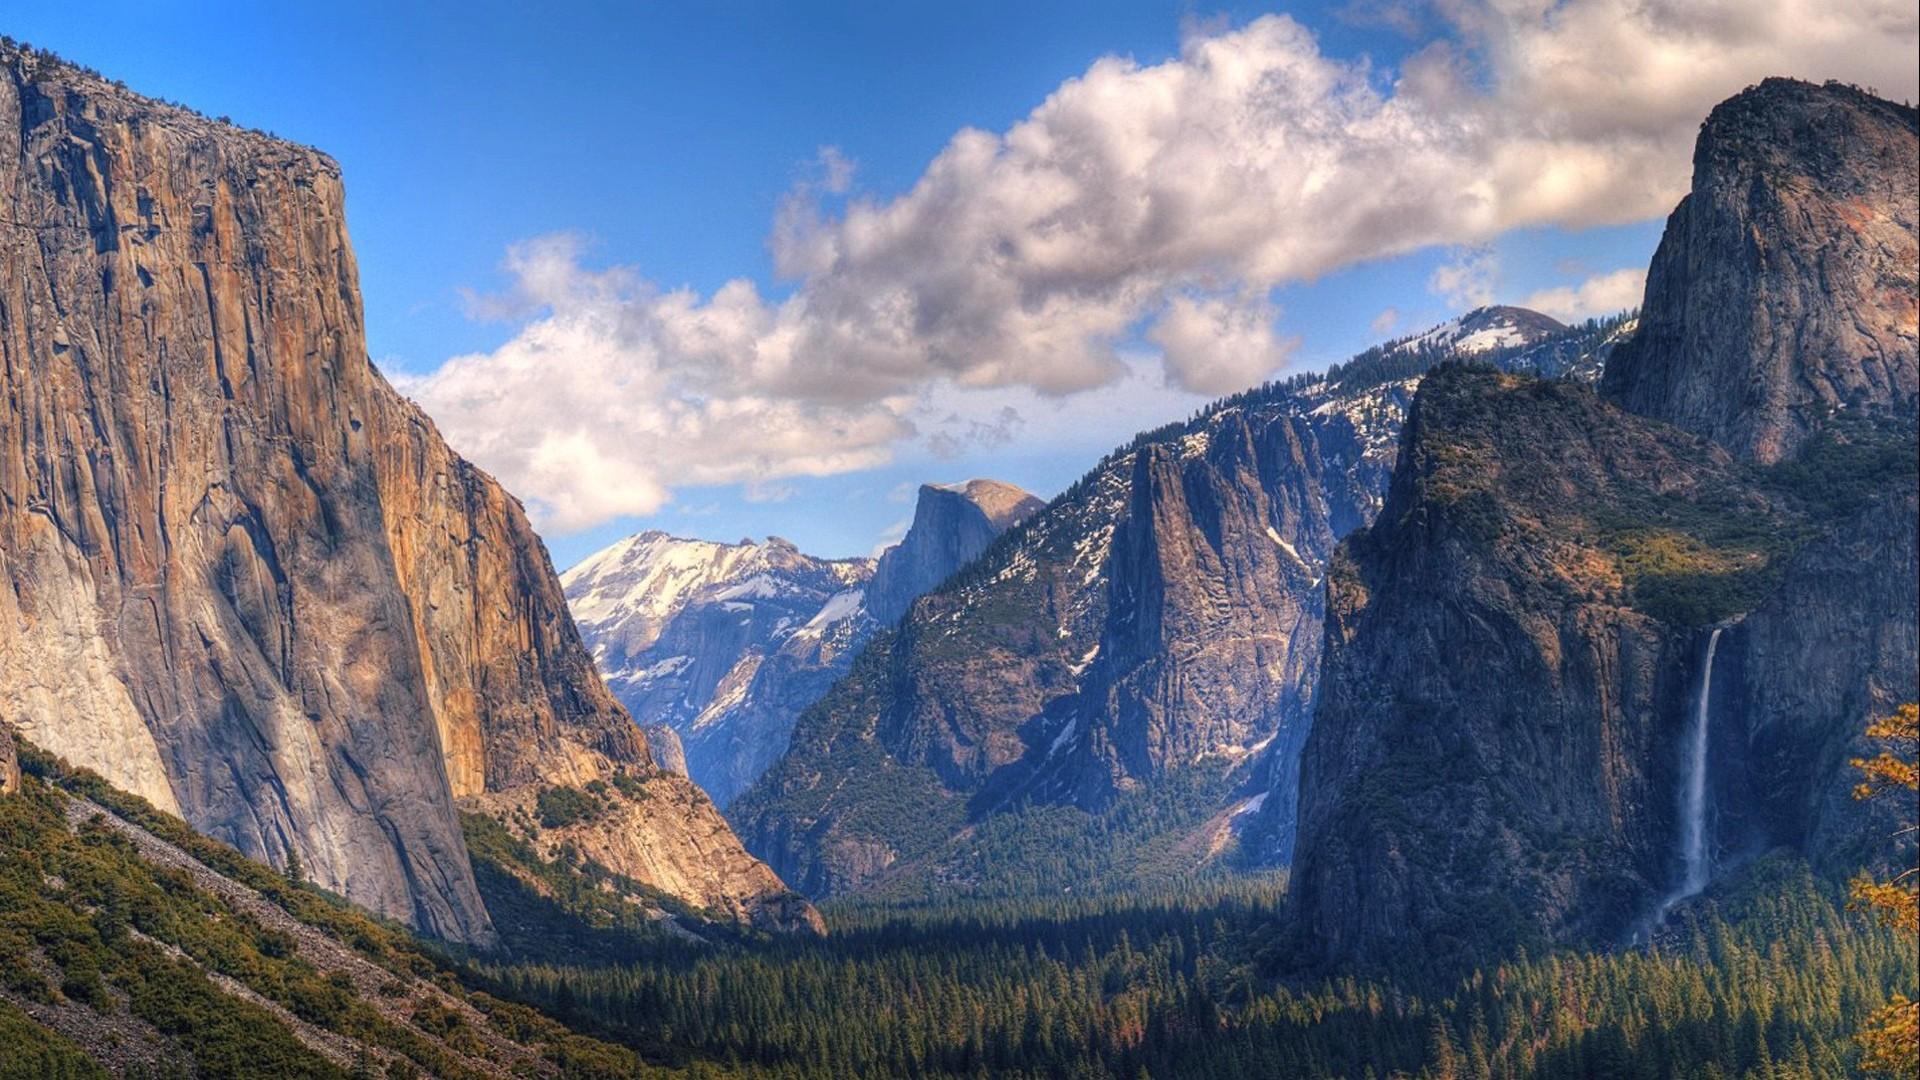 Mountains view wallpaper #46596 - Open Walls